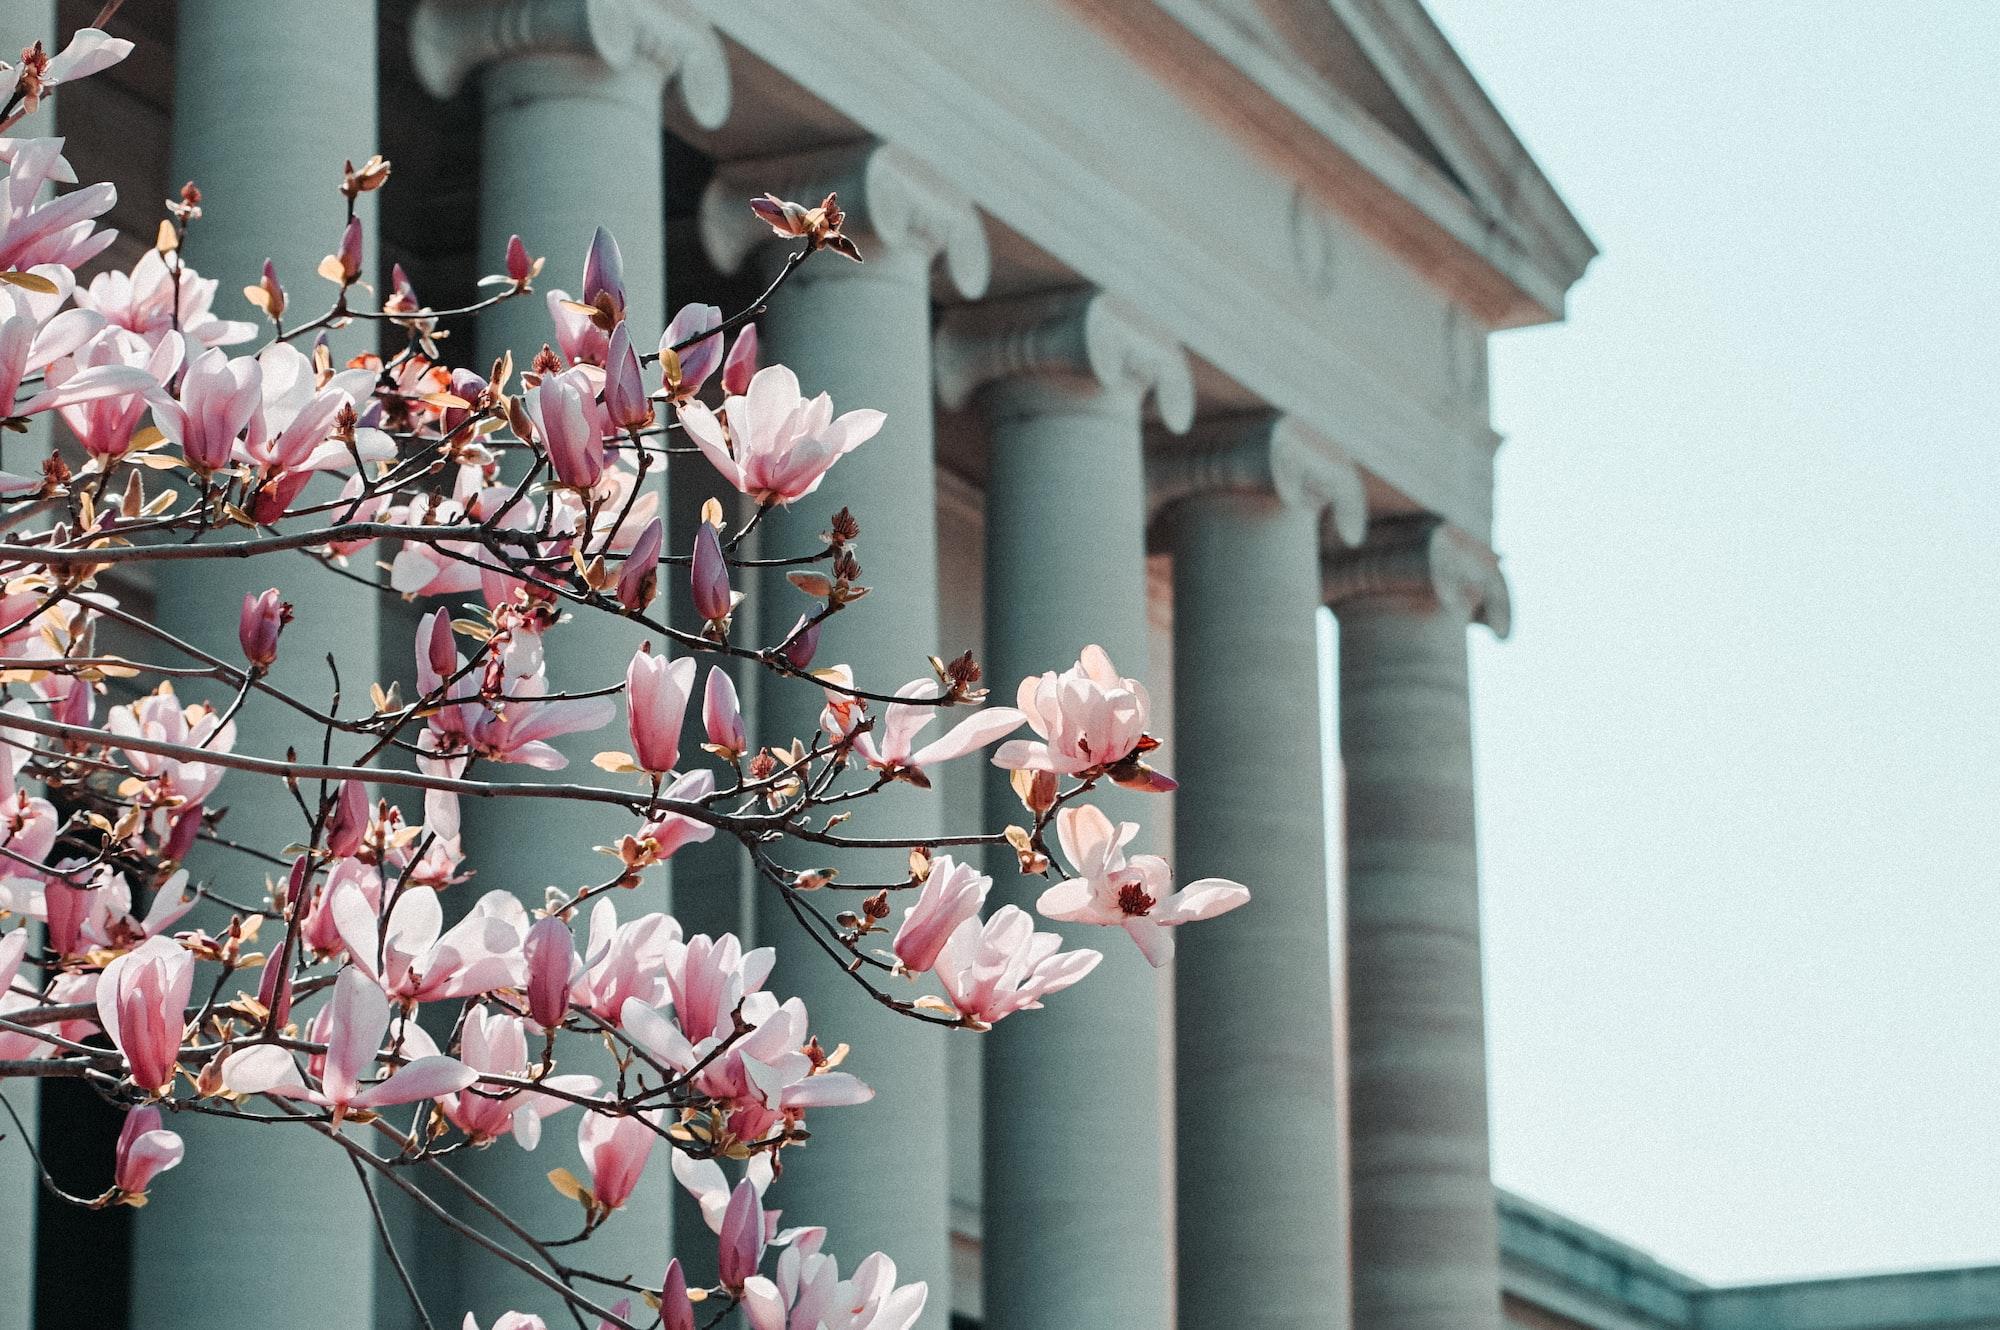 Cherry Blossoms IIWashington DC vacation rental alternatives for the 2021 Cherry Blossom Festival